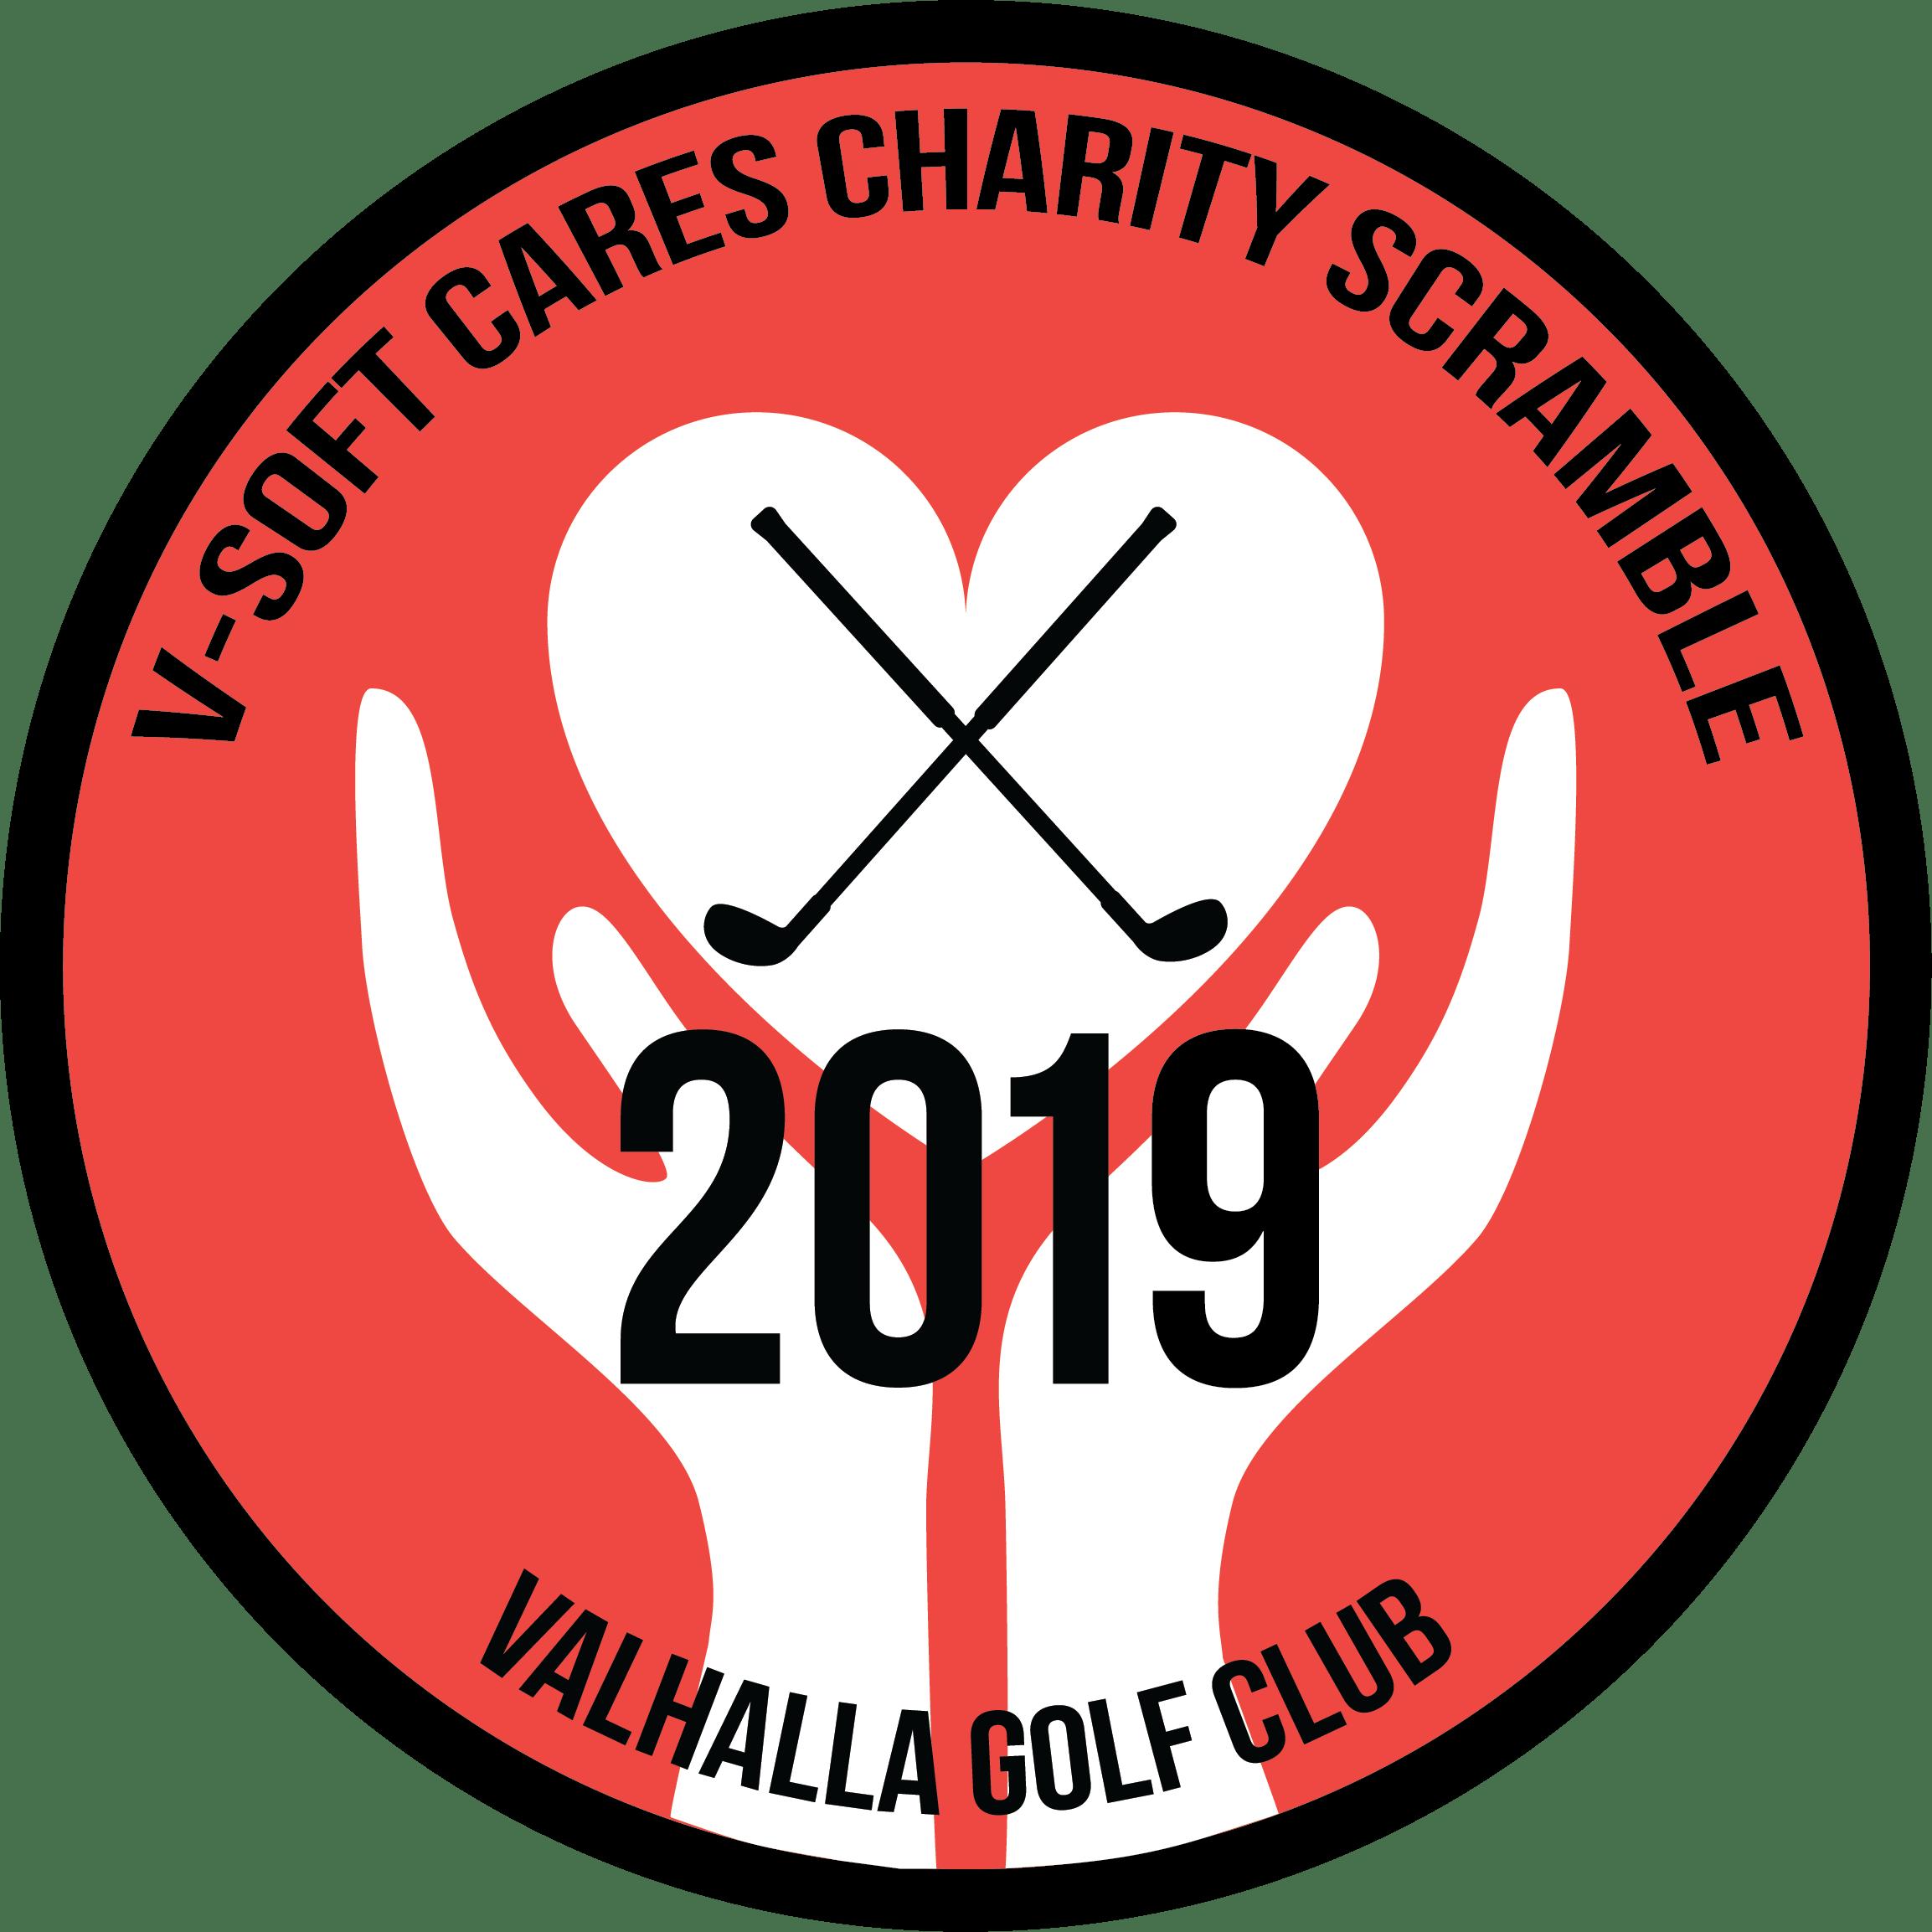 V-Soft Cares 2016 Charity Scramble Logo